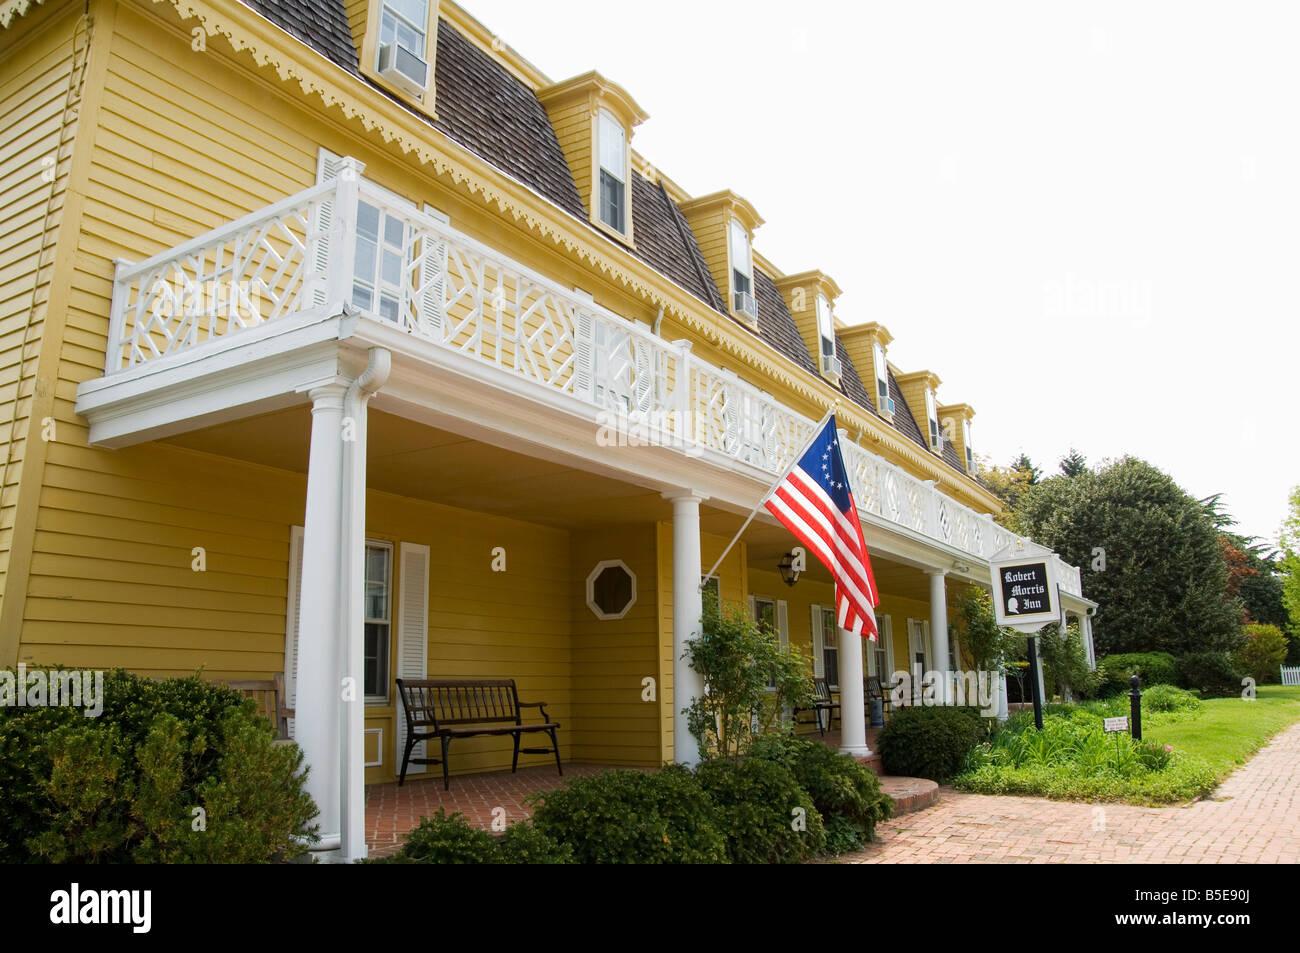 Famous historic Robert Morris Inn, Oxford, Talbot County, Chesapeake Bay area, Maryland, USA, North America - Stock Image